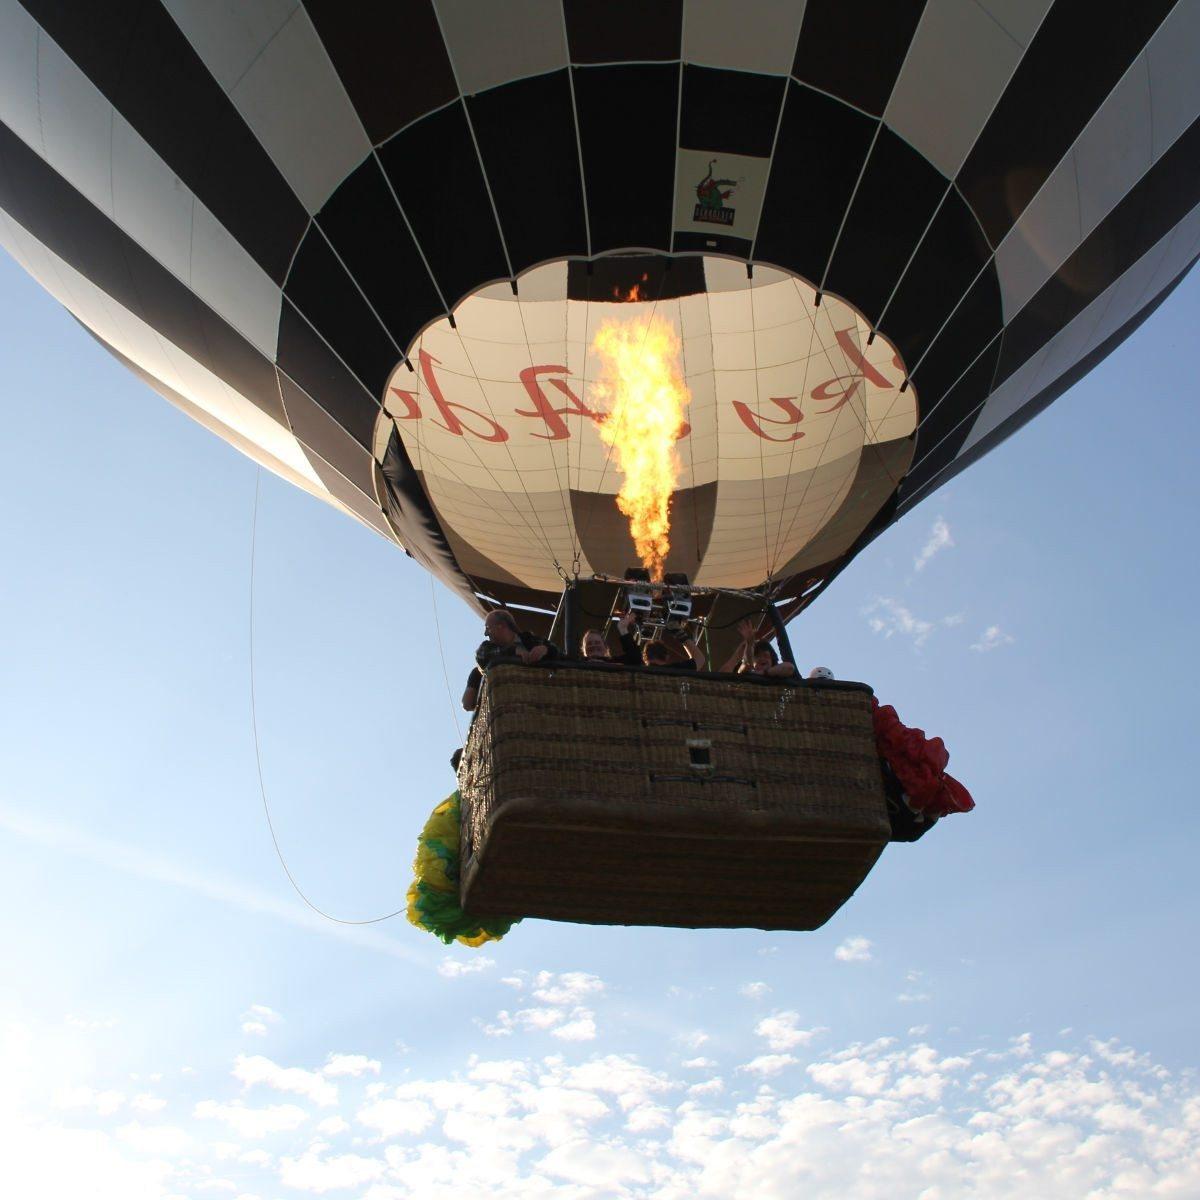 Sonnenuntergangsfahrt im Ballon - Raum Schwandorf